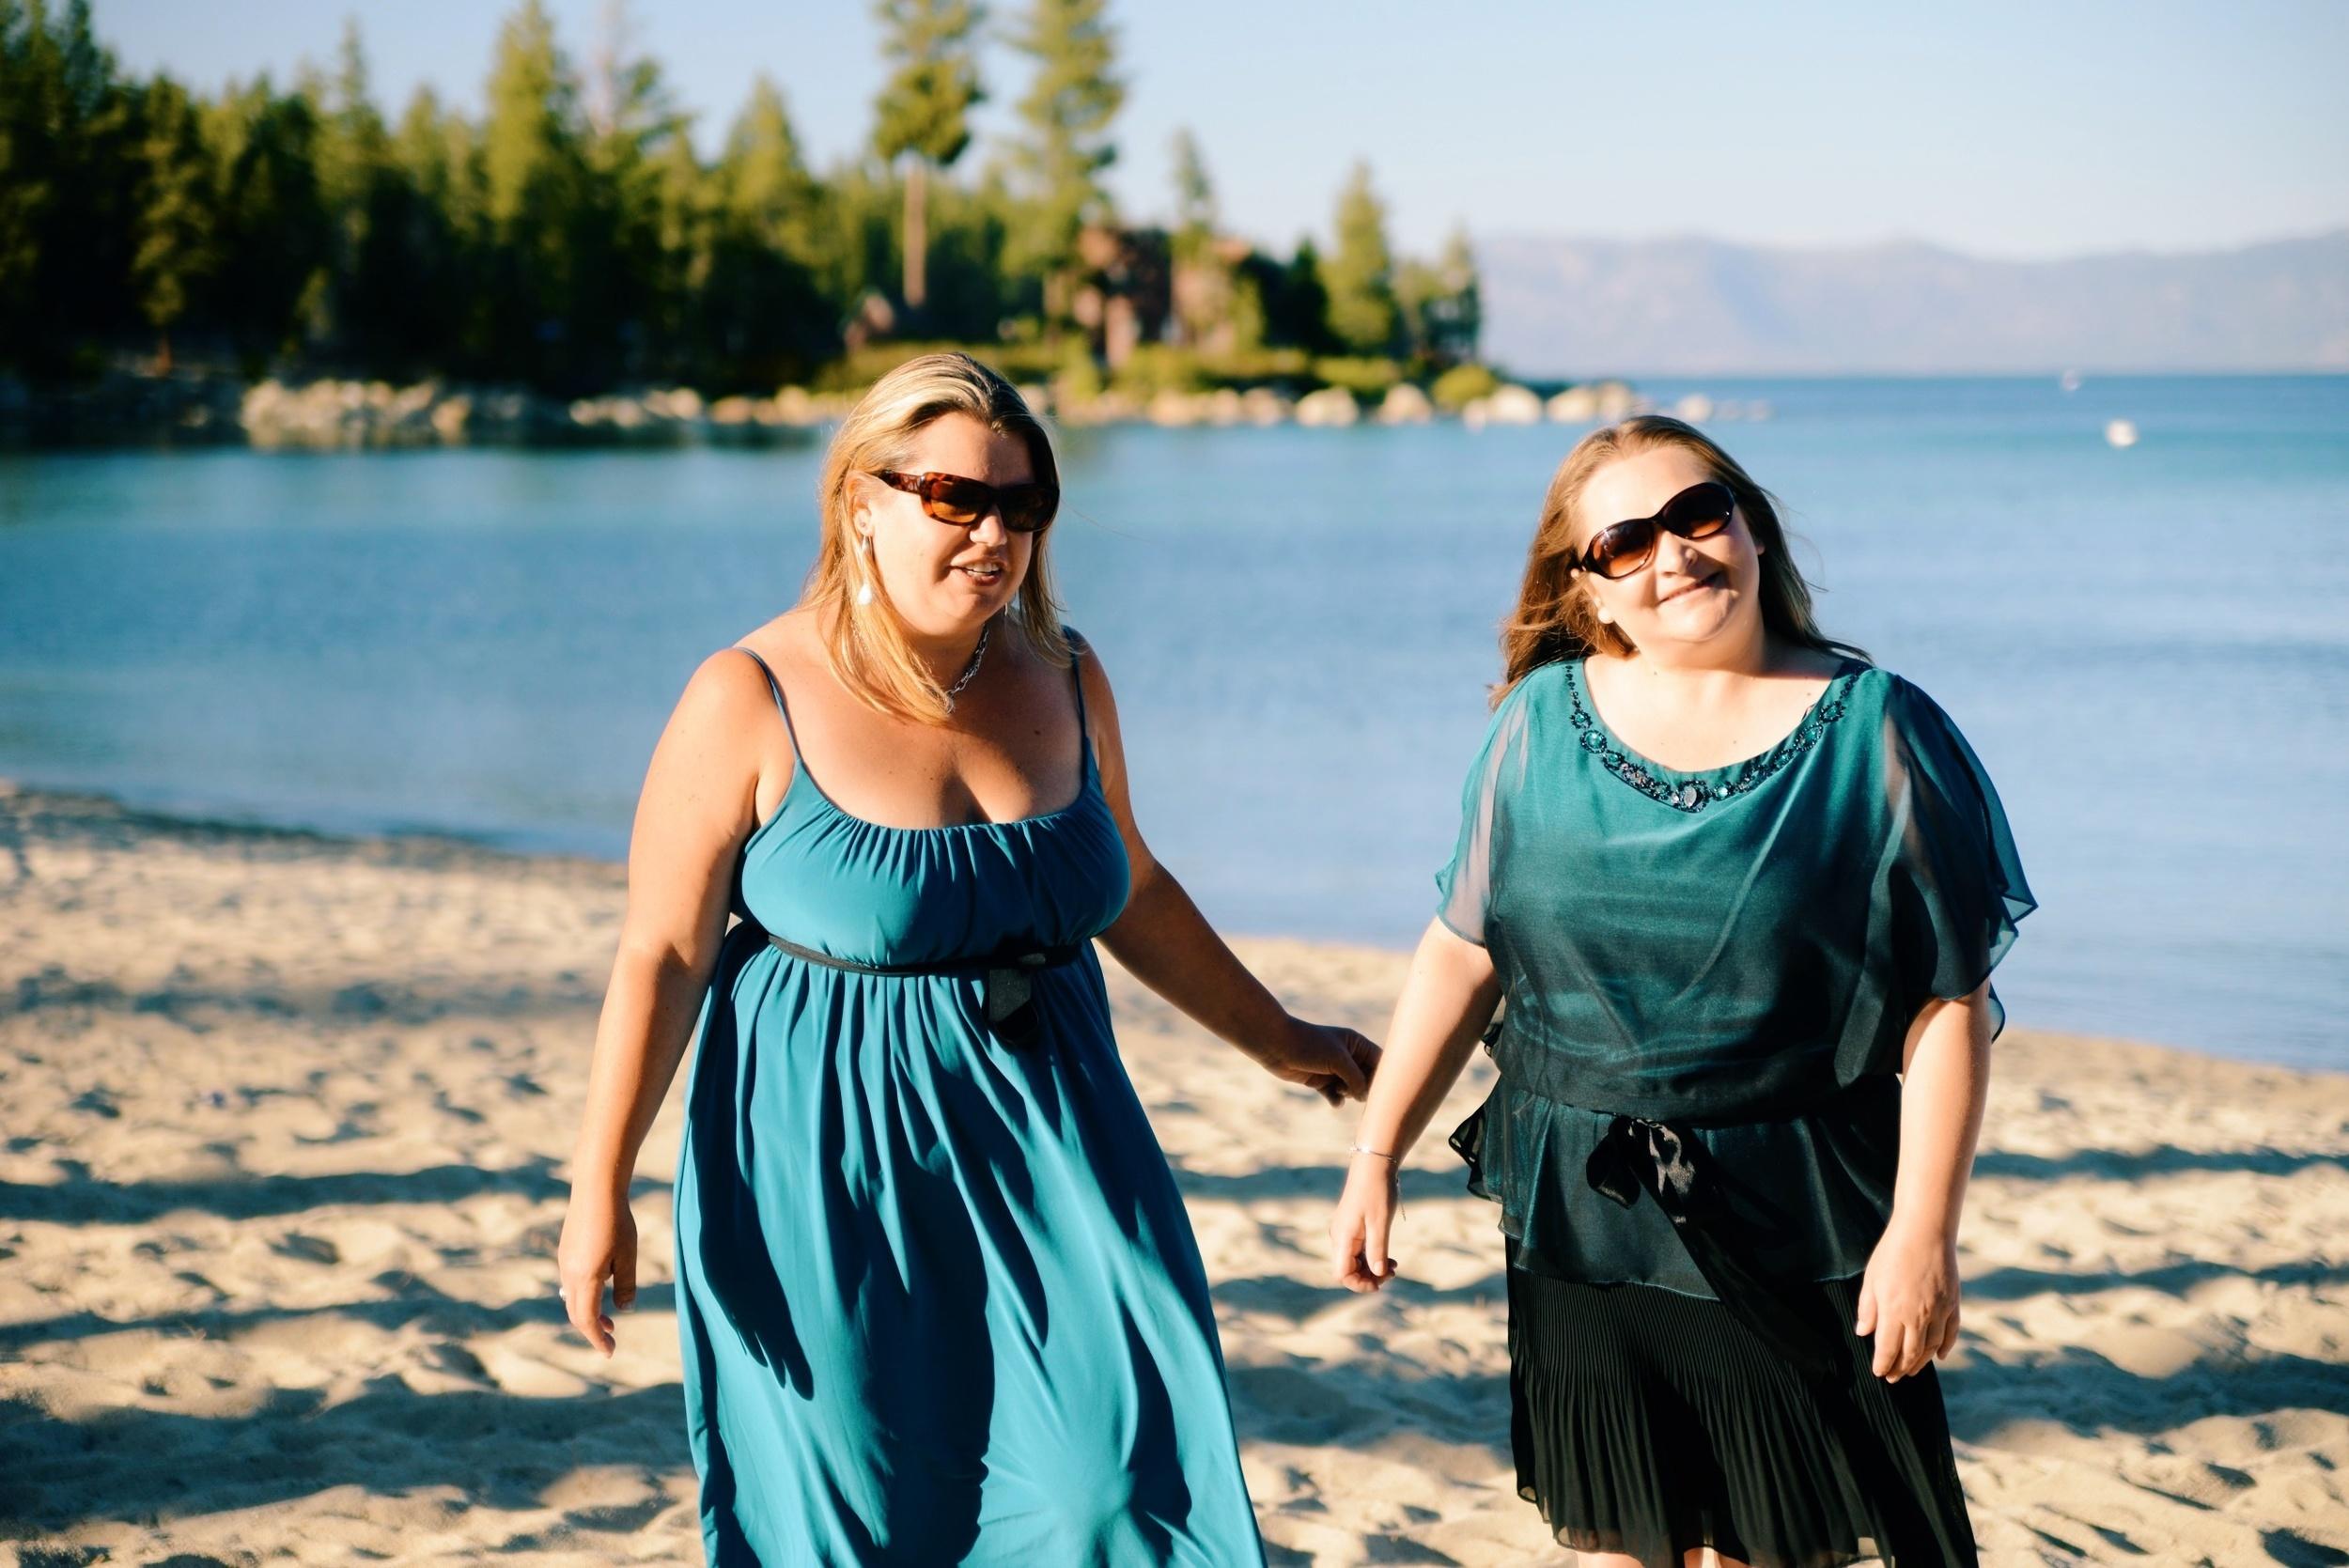 Mary and Erika on the beach